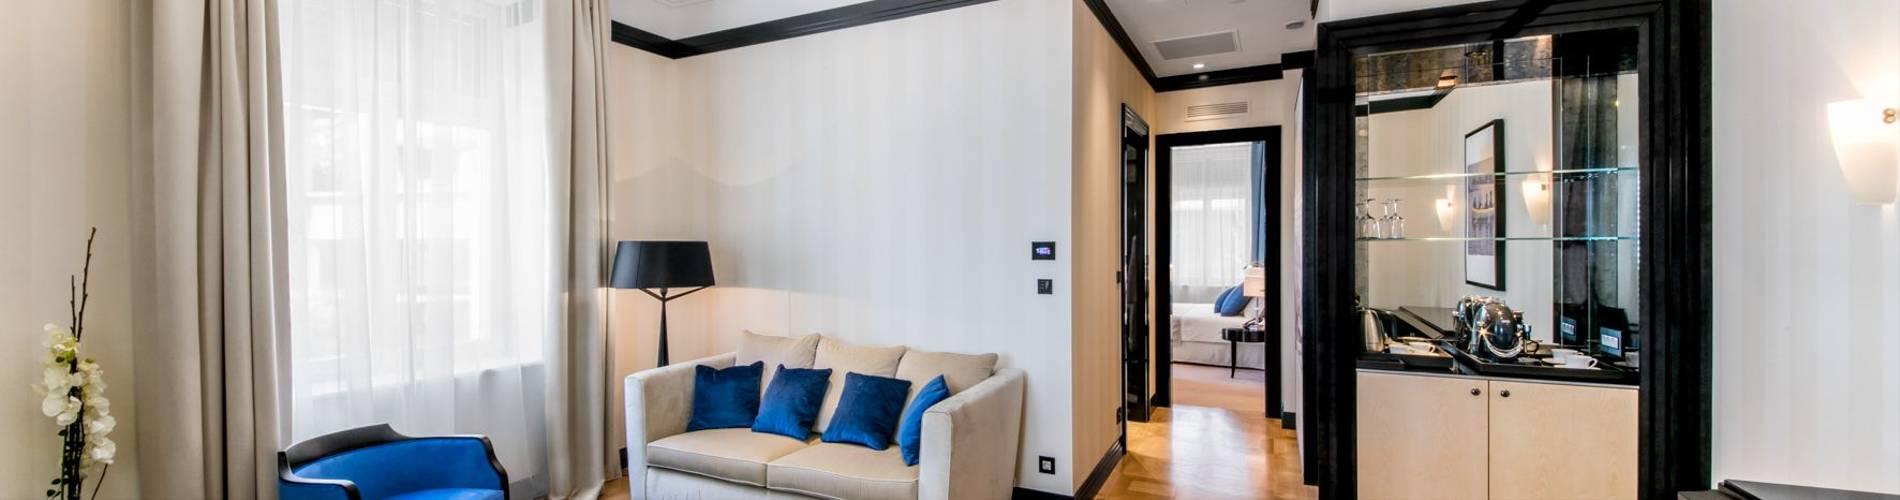 21. Boutique Hotel Alhambra_augusta suite (1).jpg